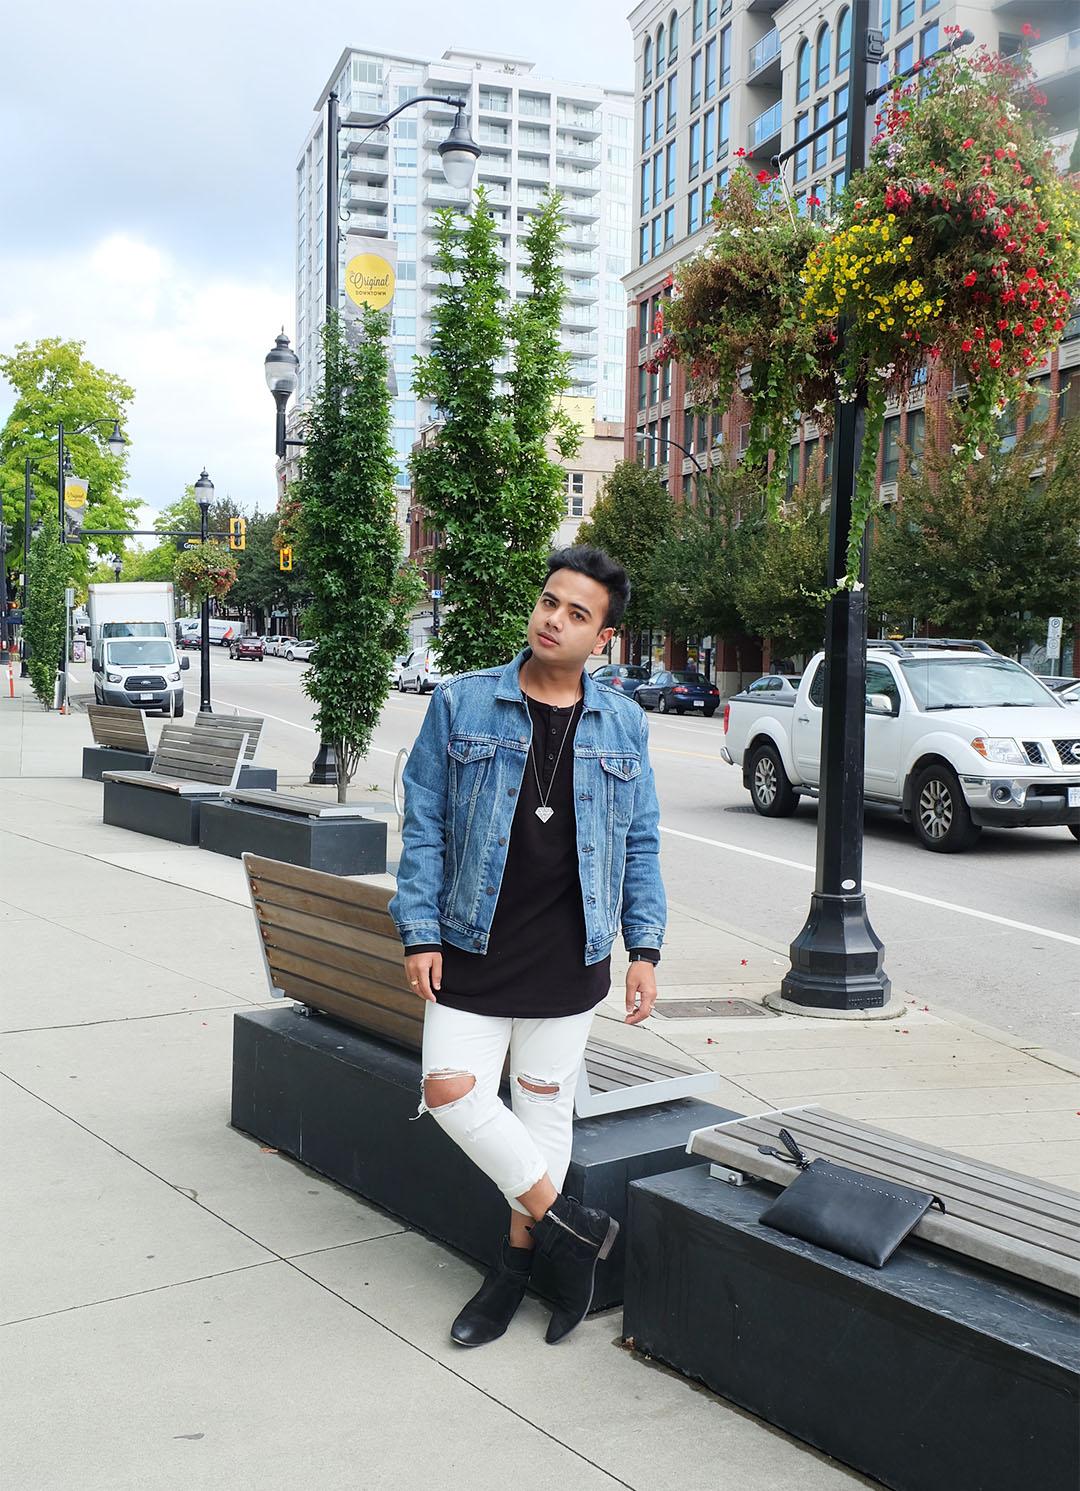 Jonathan Waiching Ho_Levis Denim Jacekt_Top Bloggers Canada_Influencer in Vancouver_2